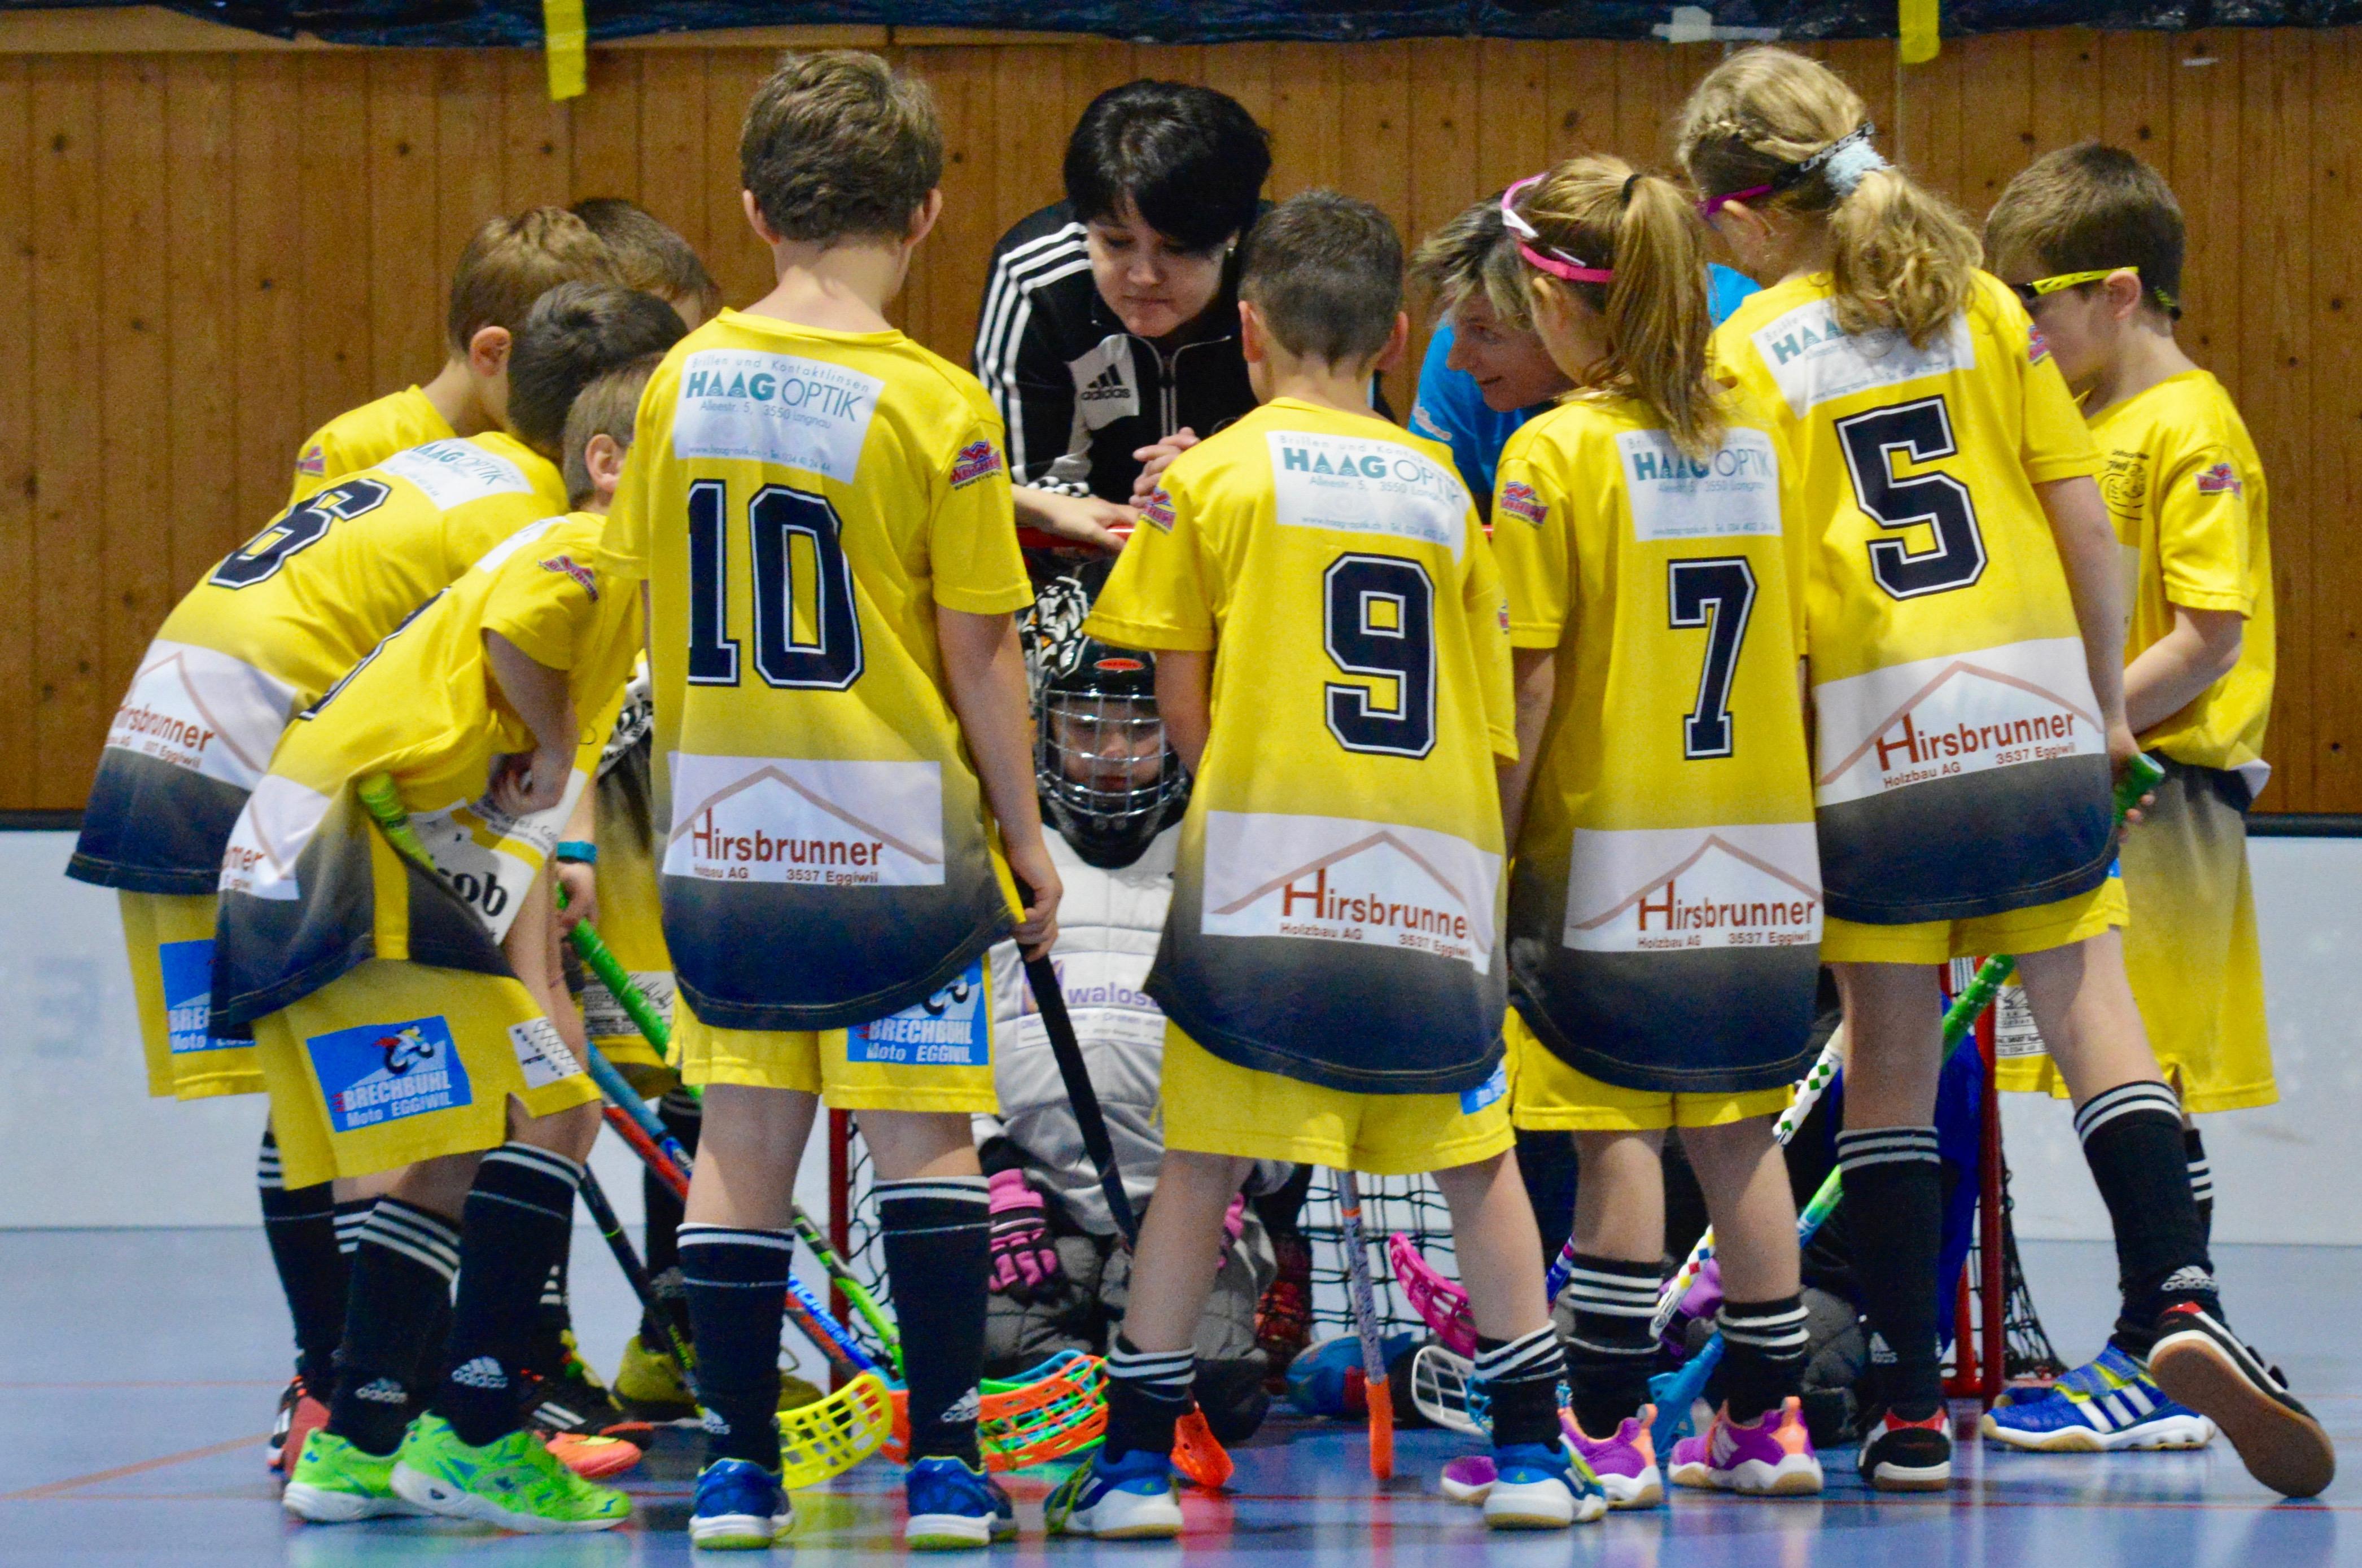 Junioren E I - Floorball Köniz Saison 2016/17